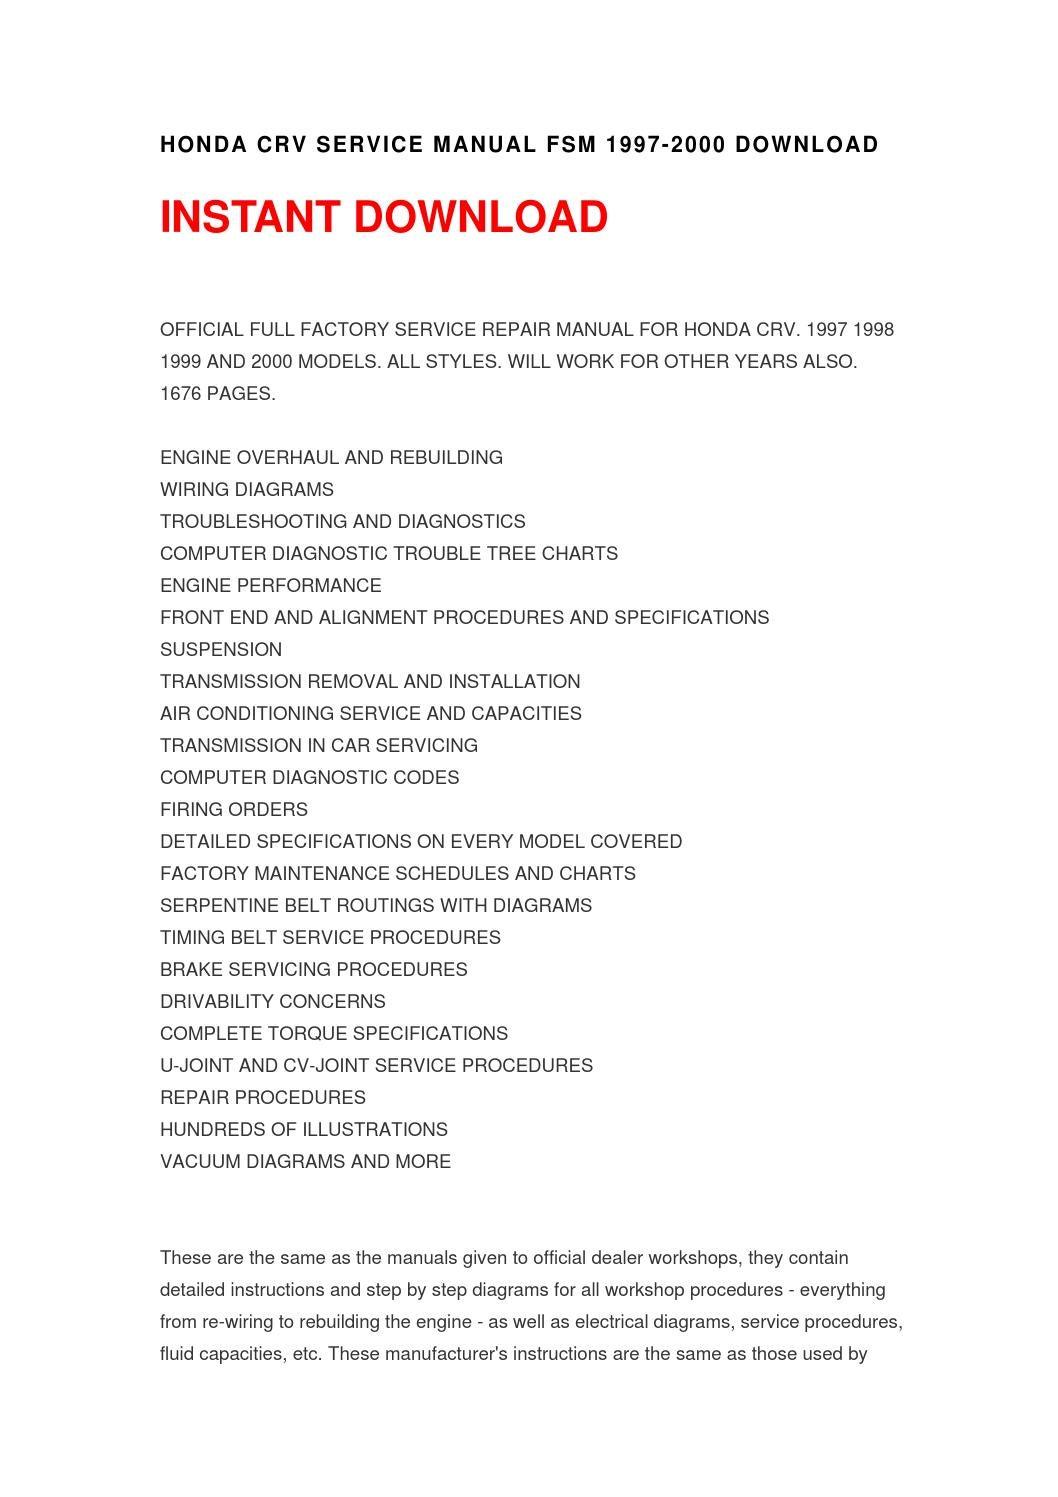 2015 honda cr-v service manual download